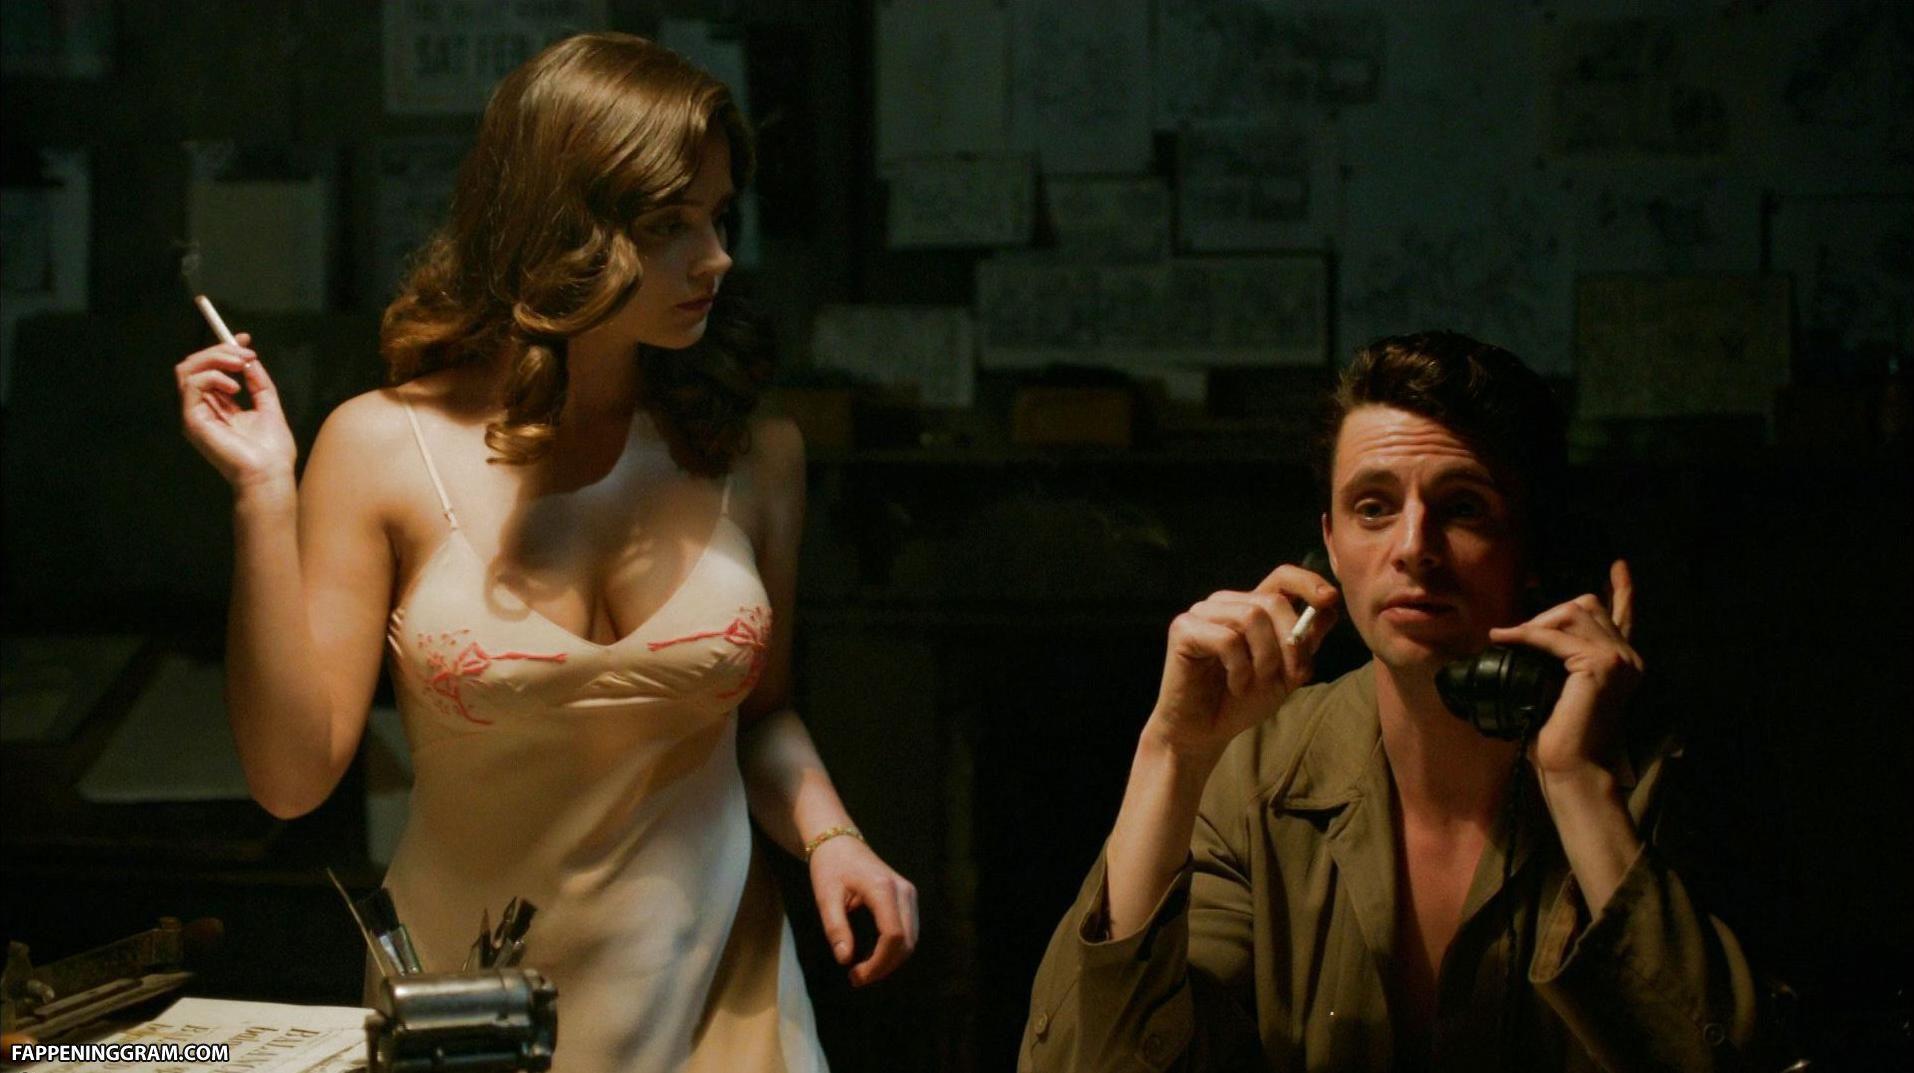 Topless jenna coleman Jenna